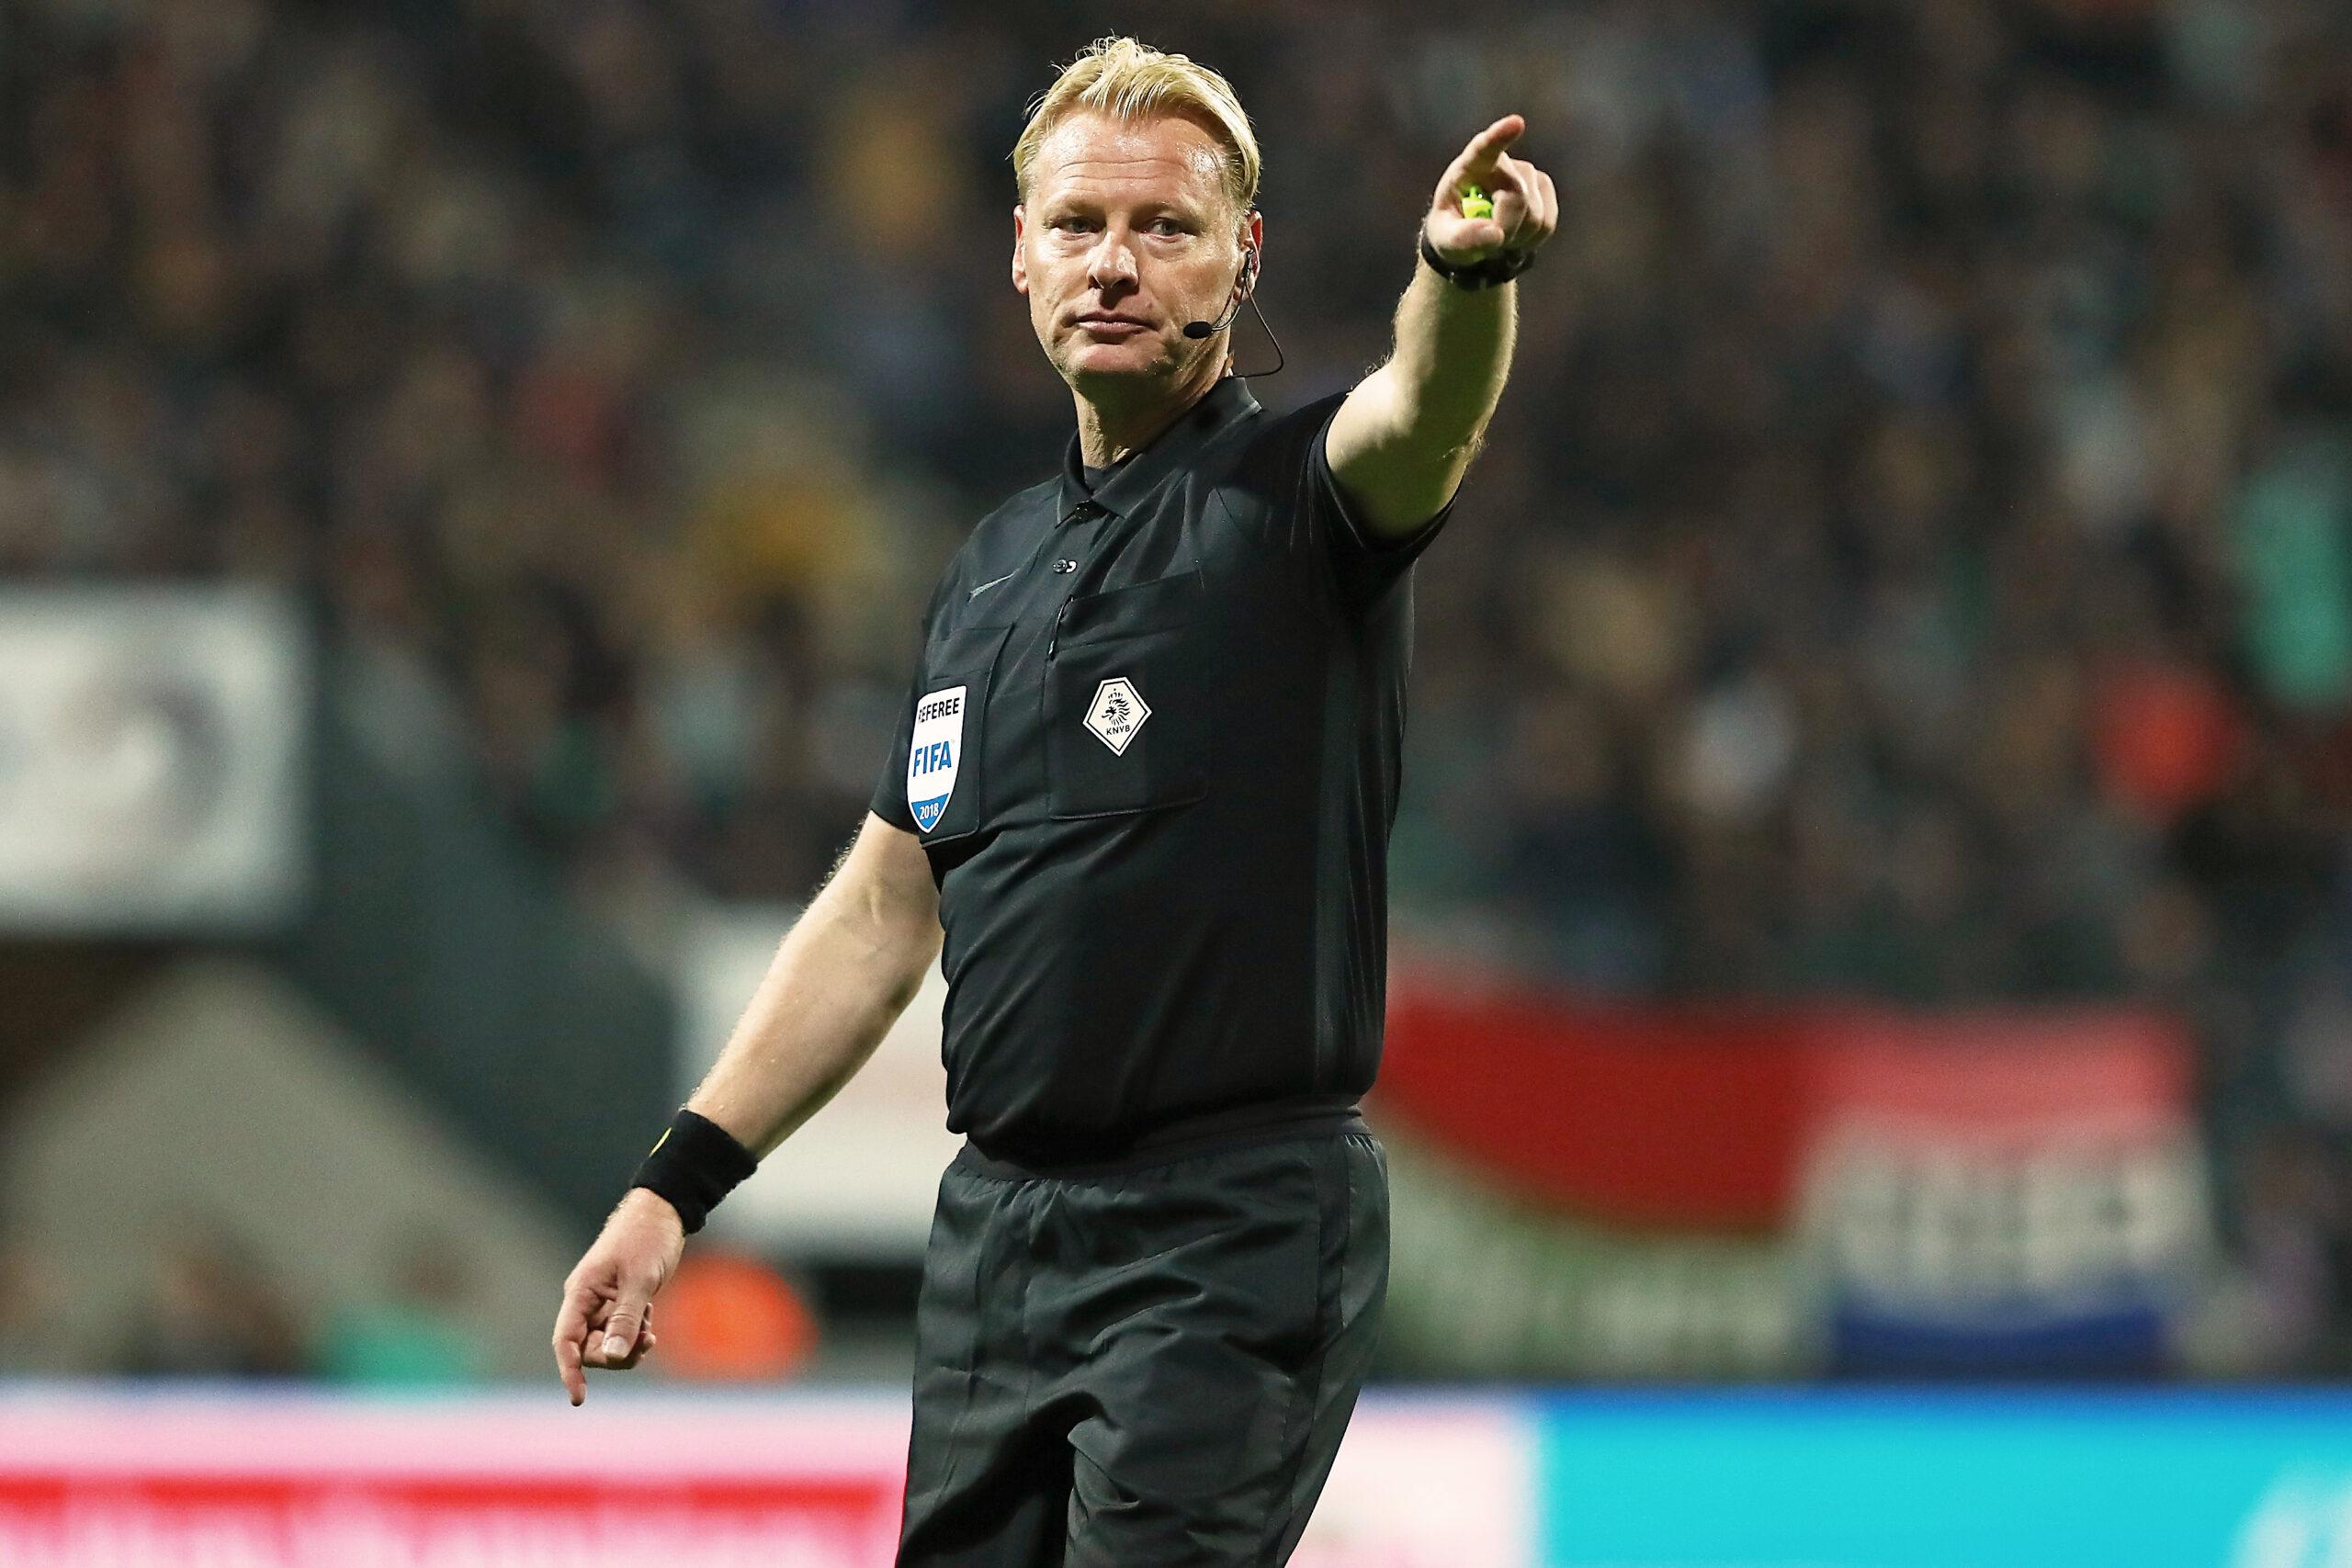 NEC led by Kevin Blom – FC Twente